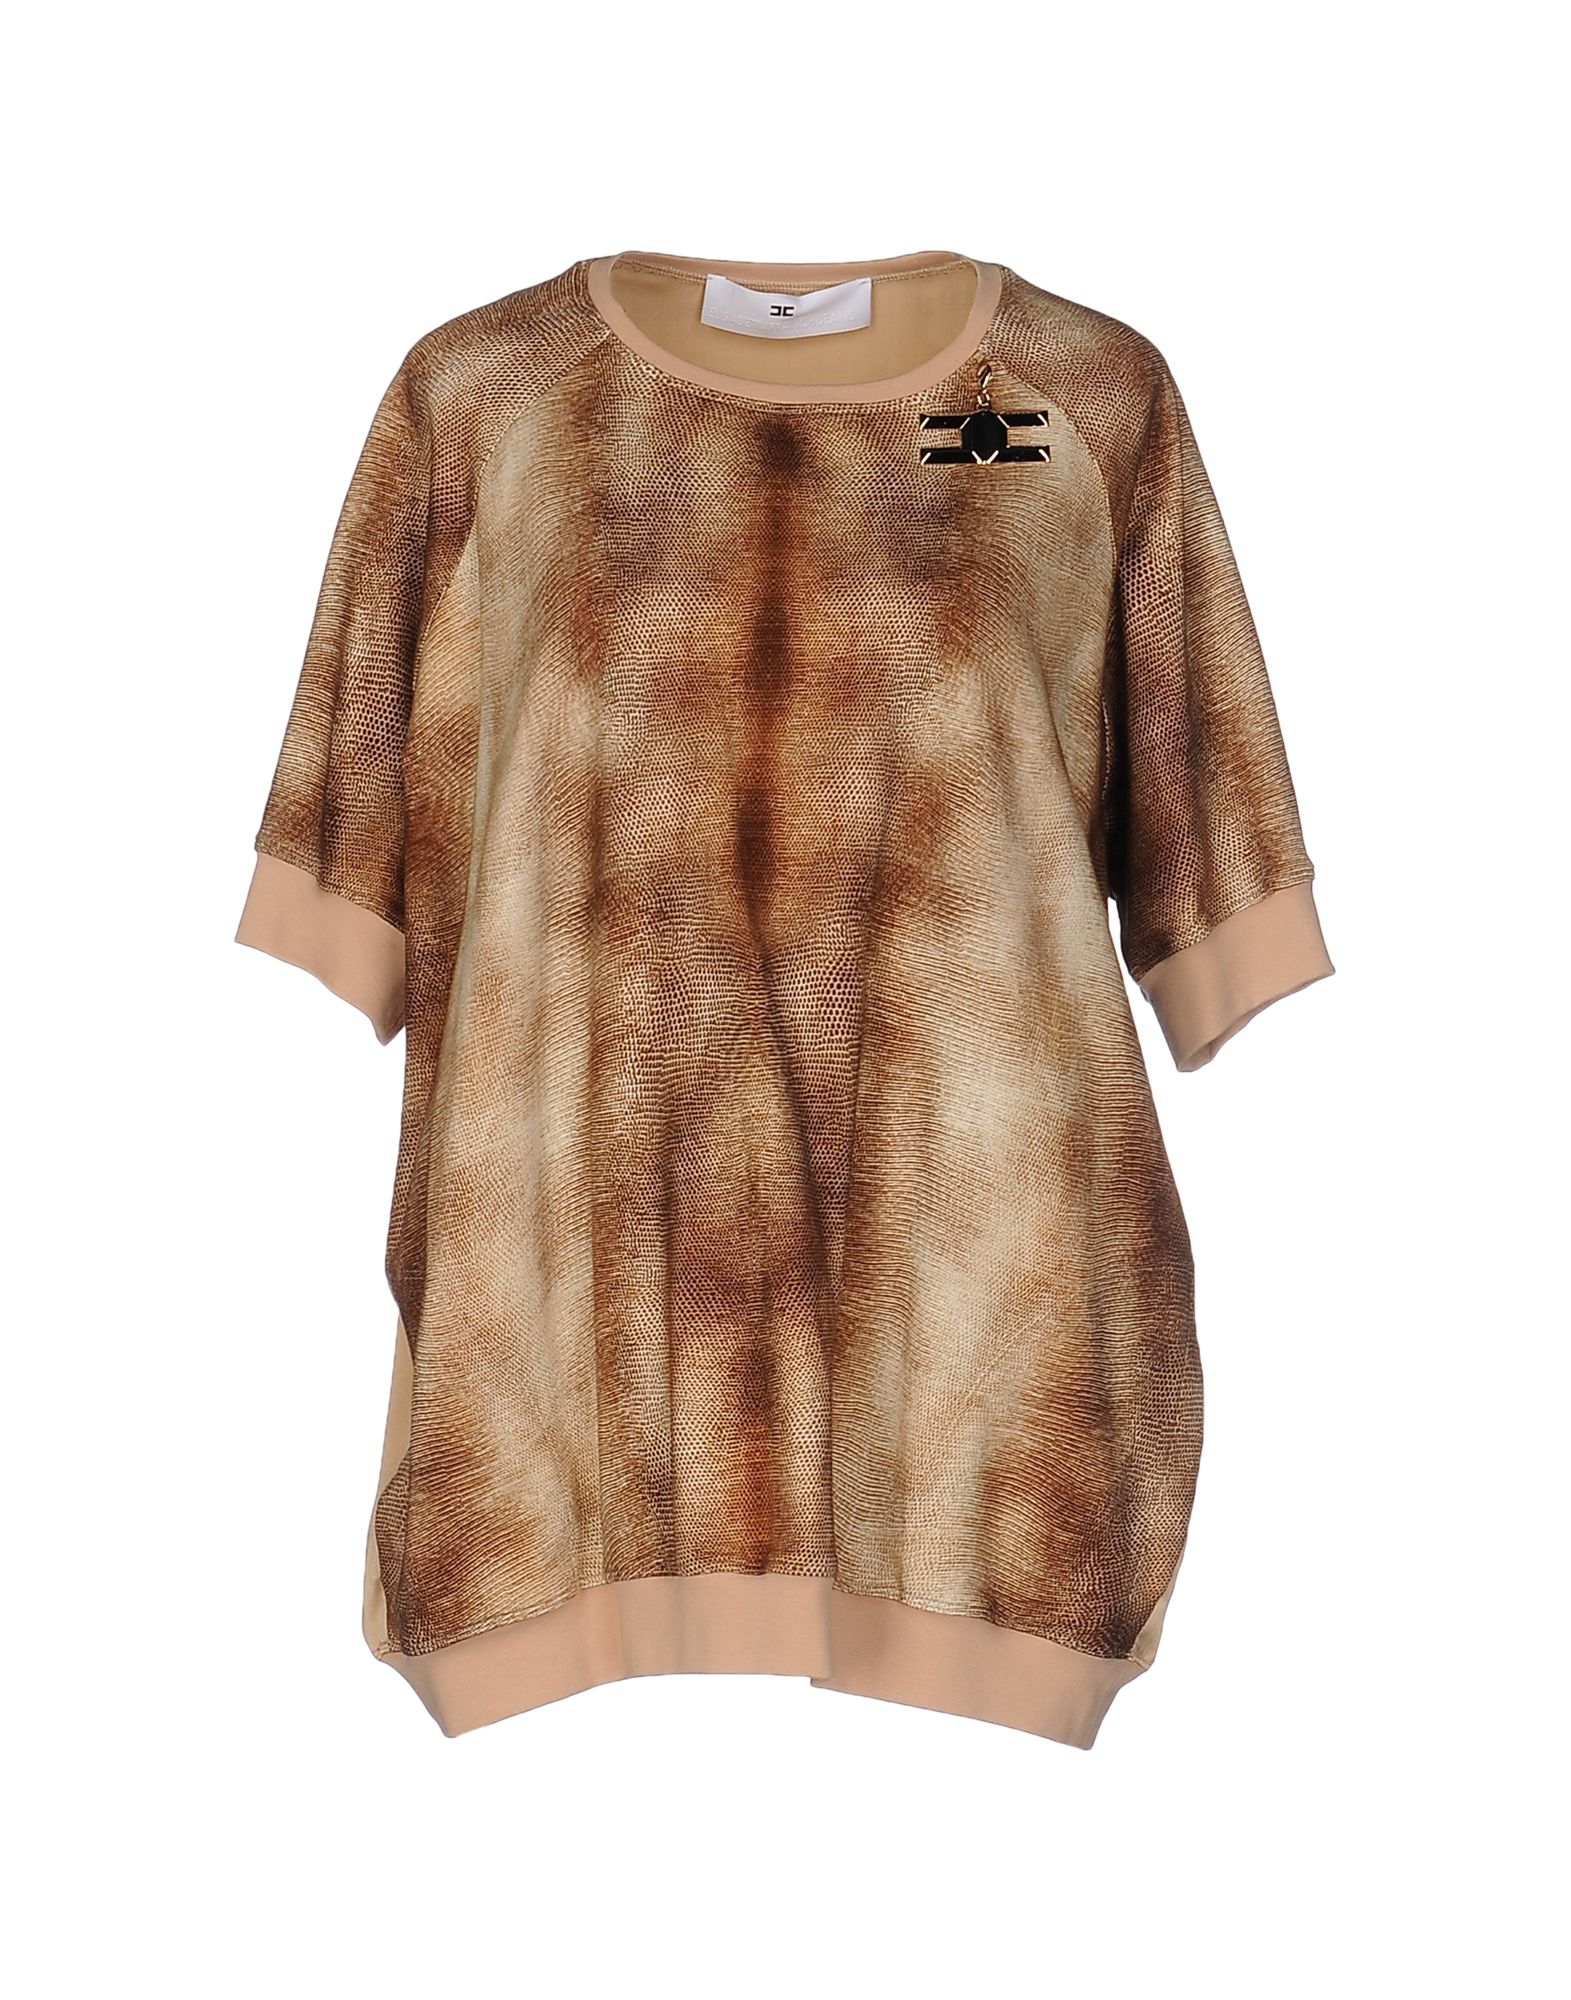 Sweater for Women Jumper On Sale, Beige, Cotton, 2017, 12 8 Elisabetta Franchi